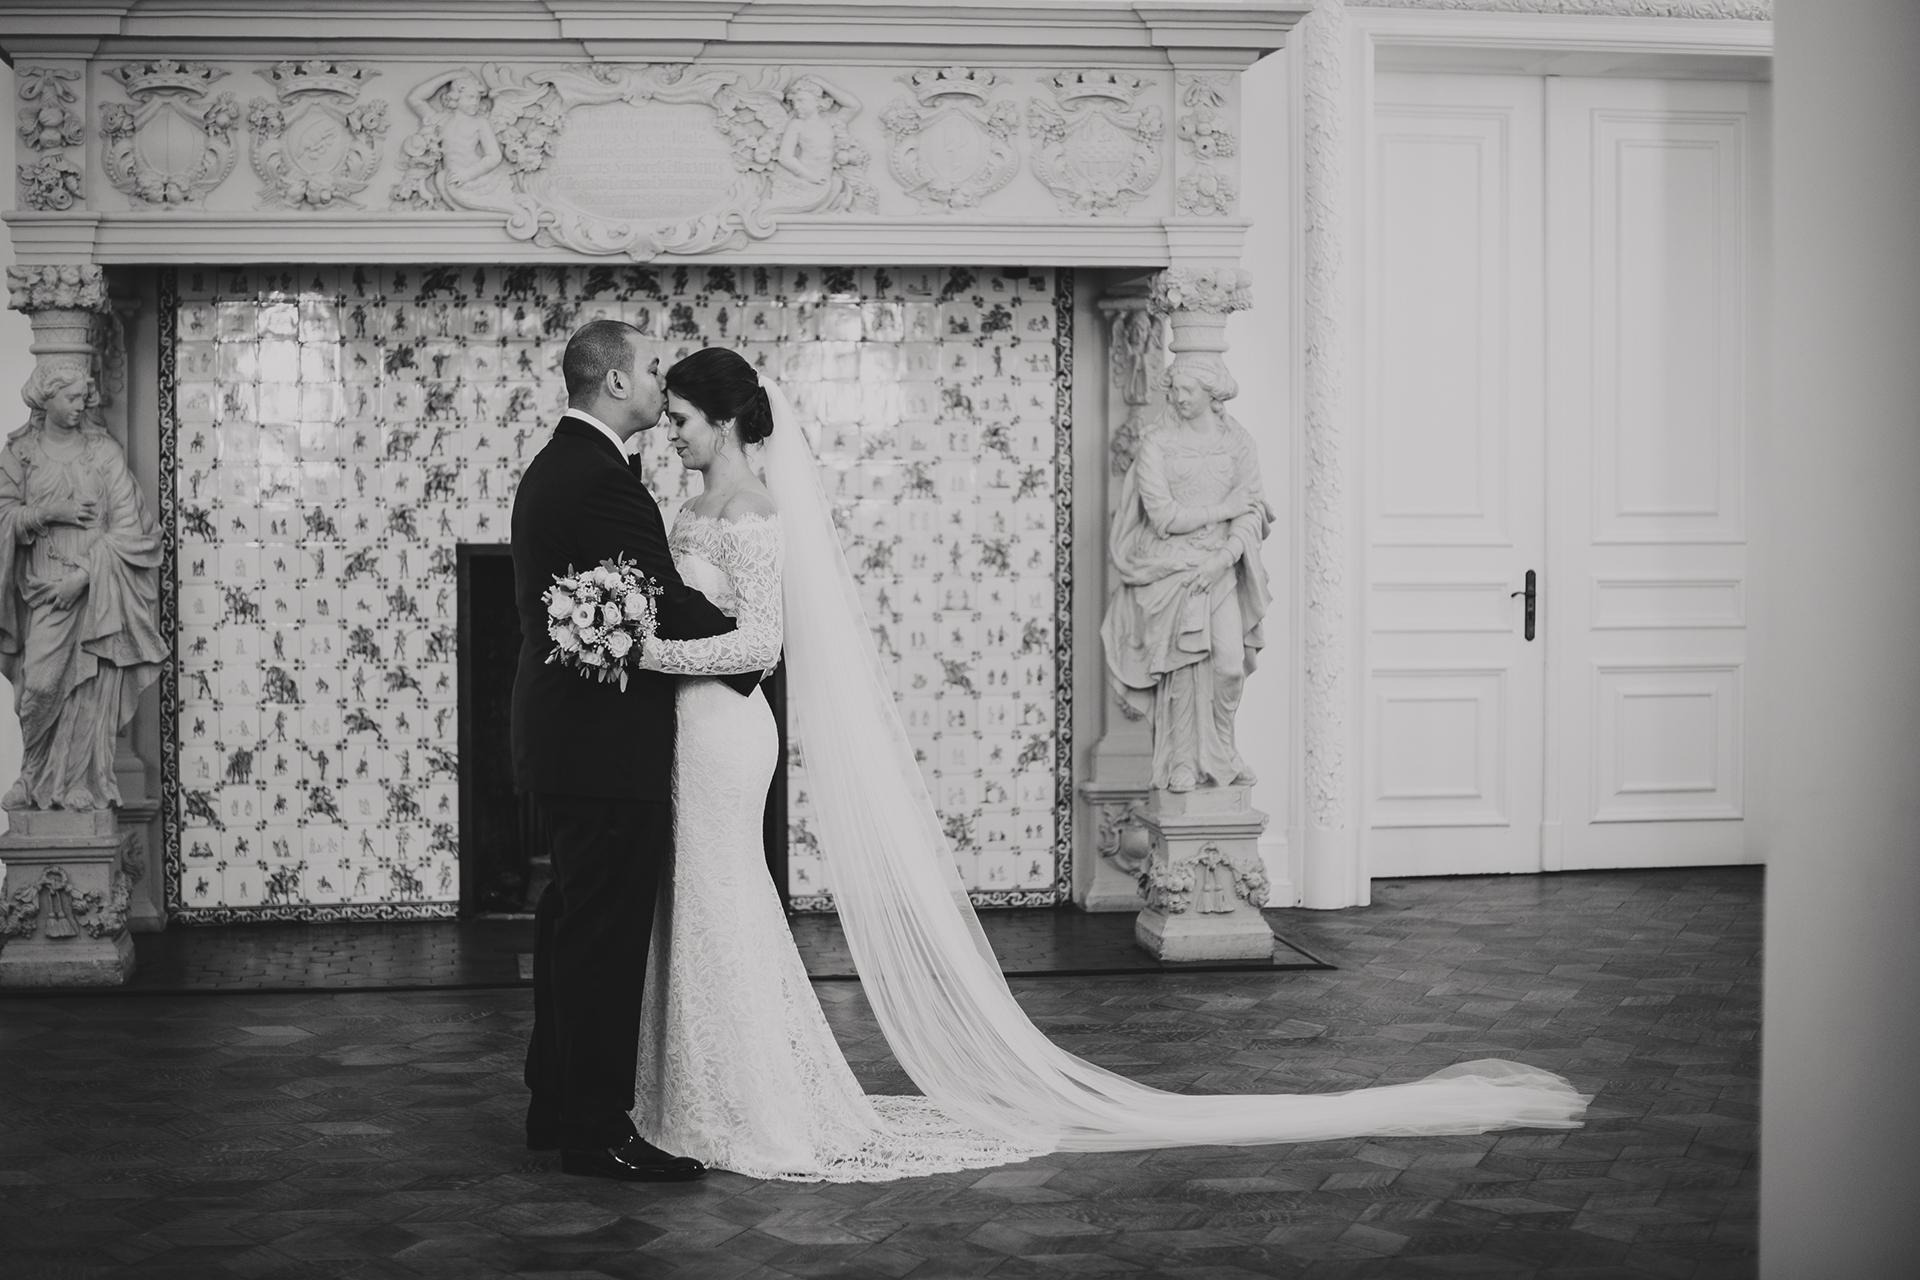 Hochzeitsreportage_J&D_045_Caroline Queda Fotografie